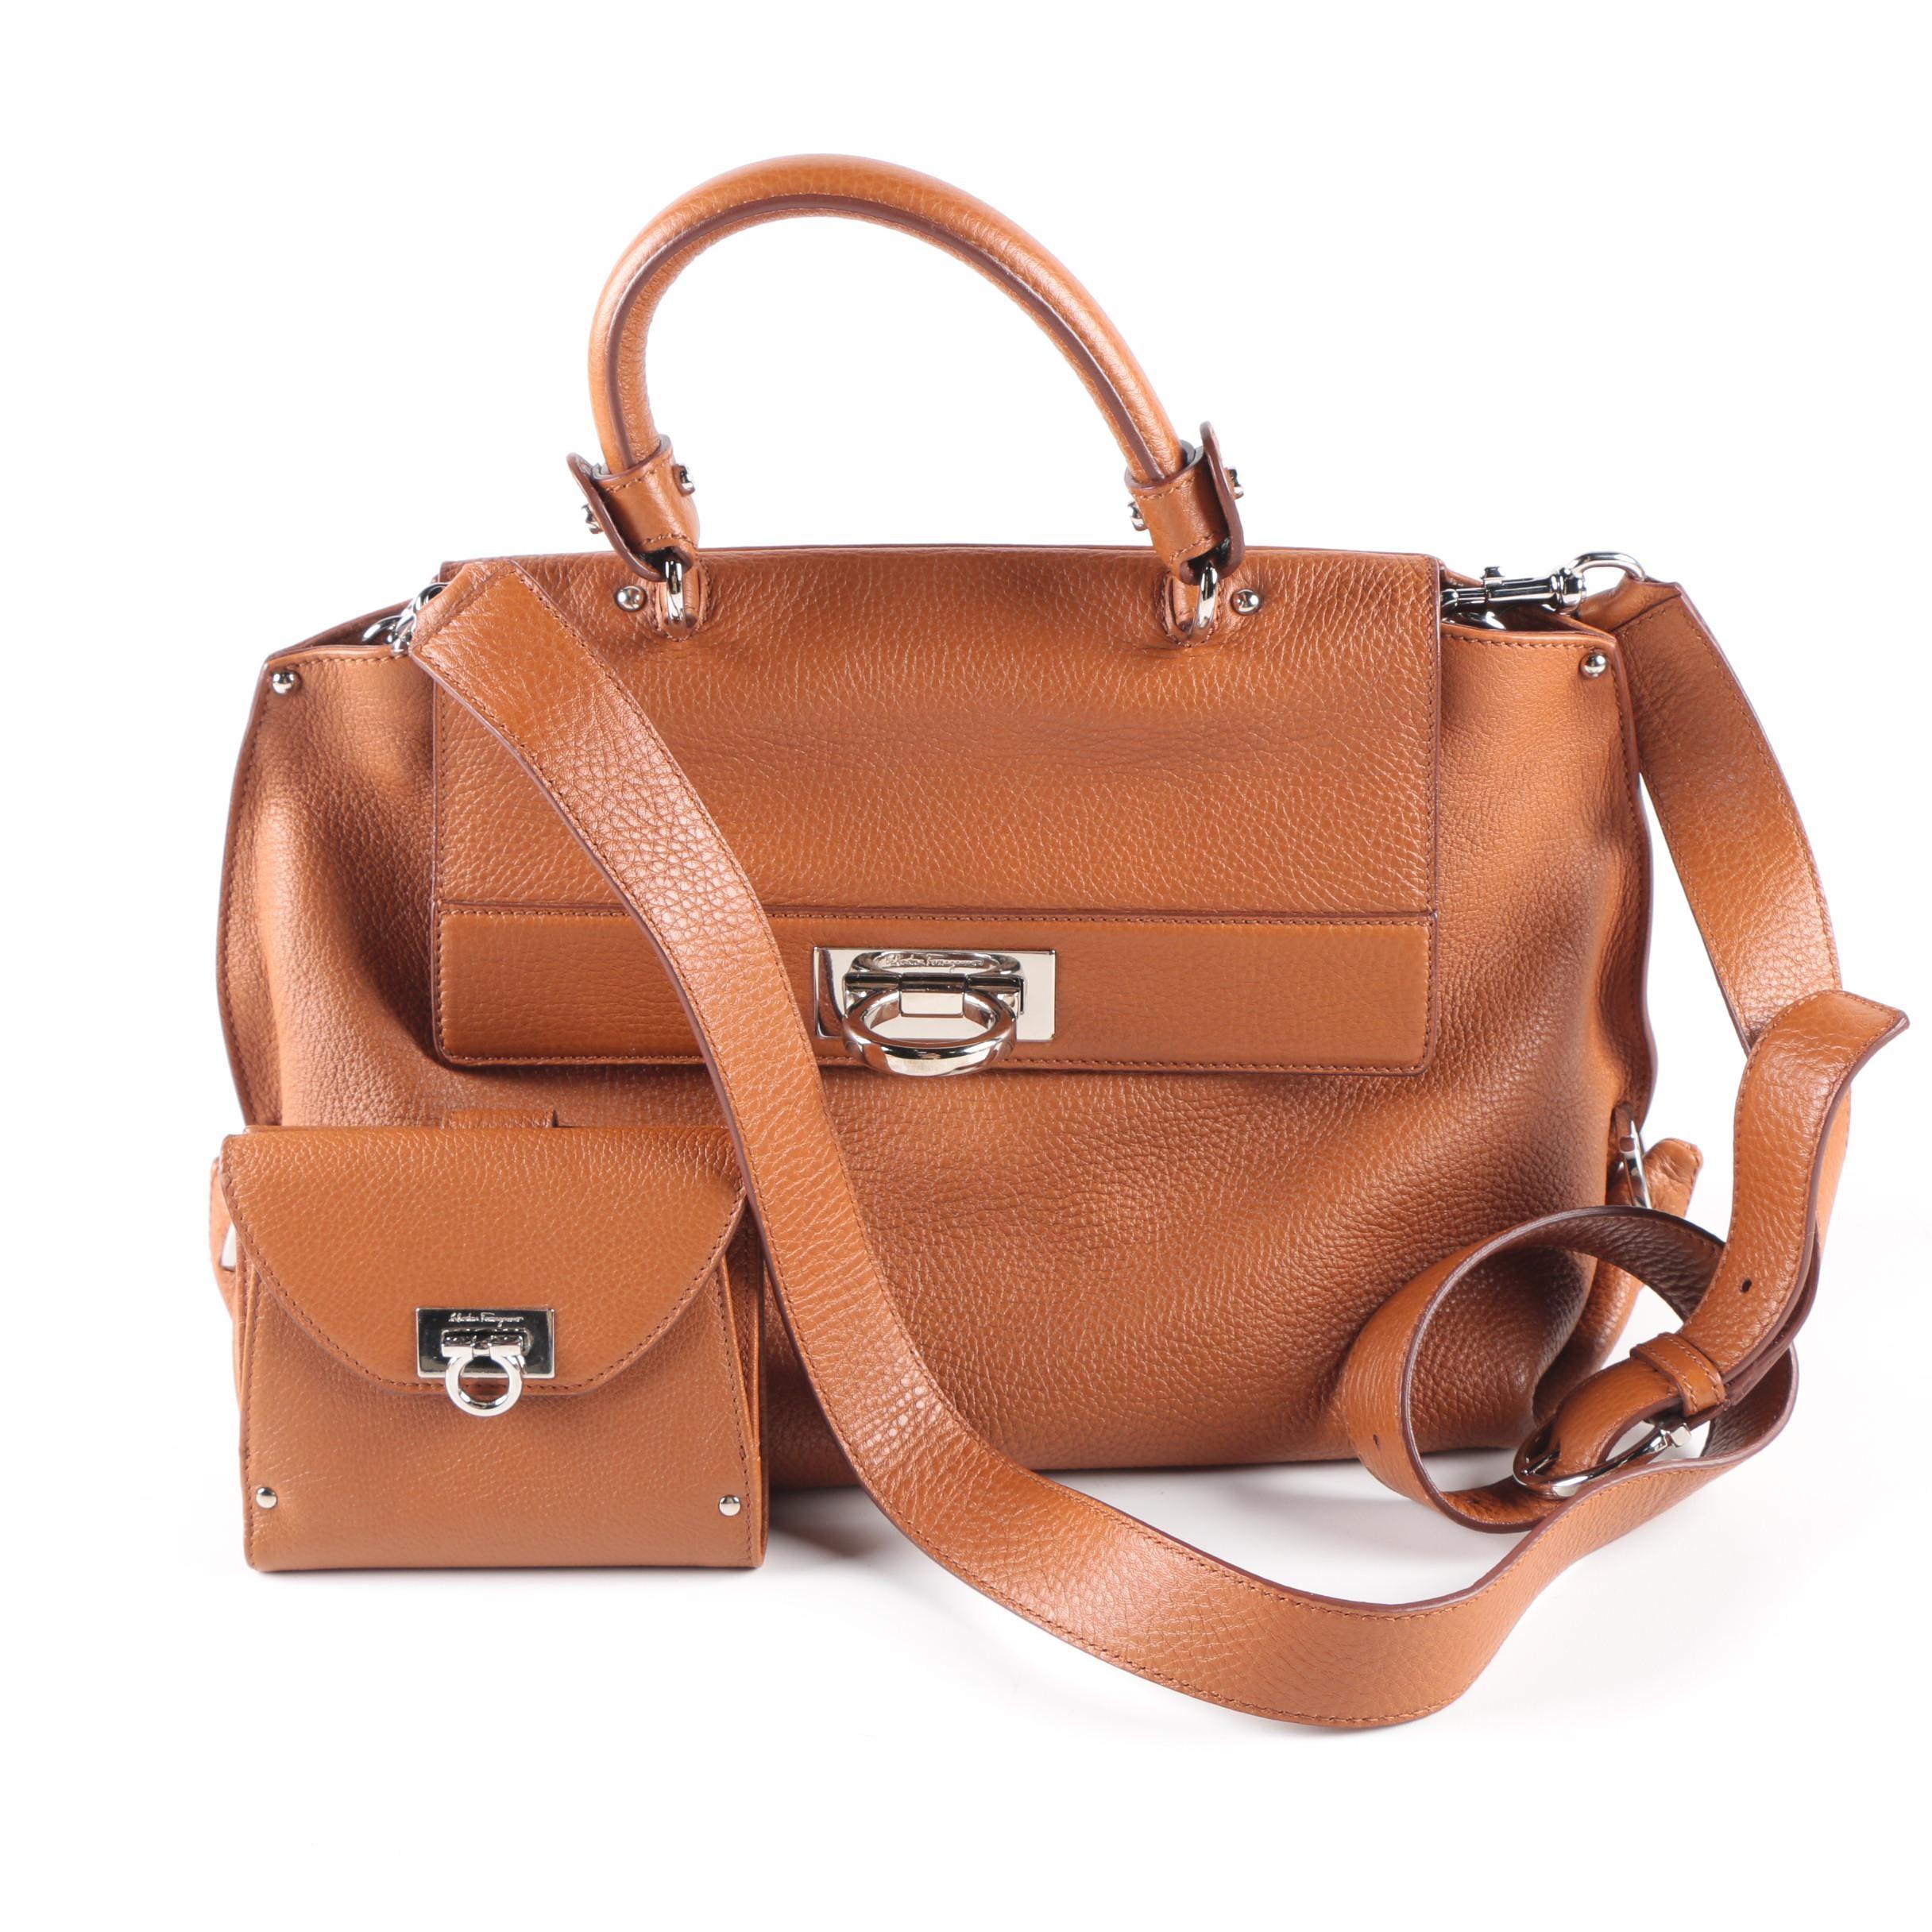 Salvatore Ferragamo Handbag and Matching Wallet